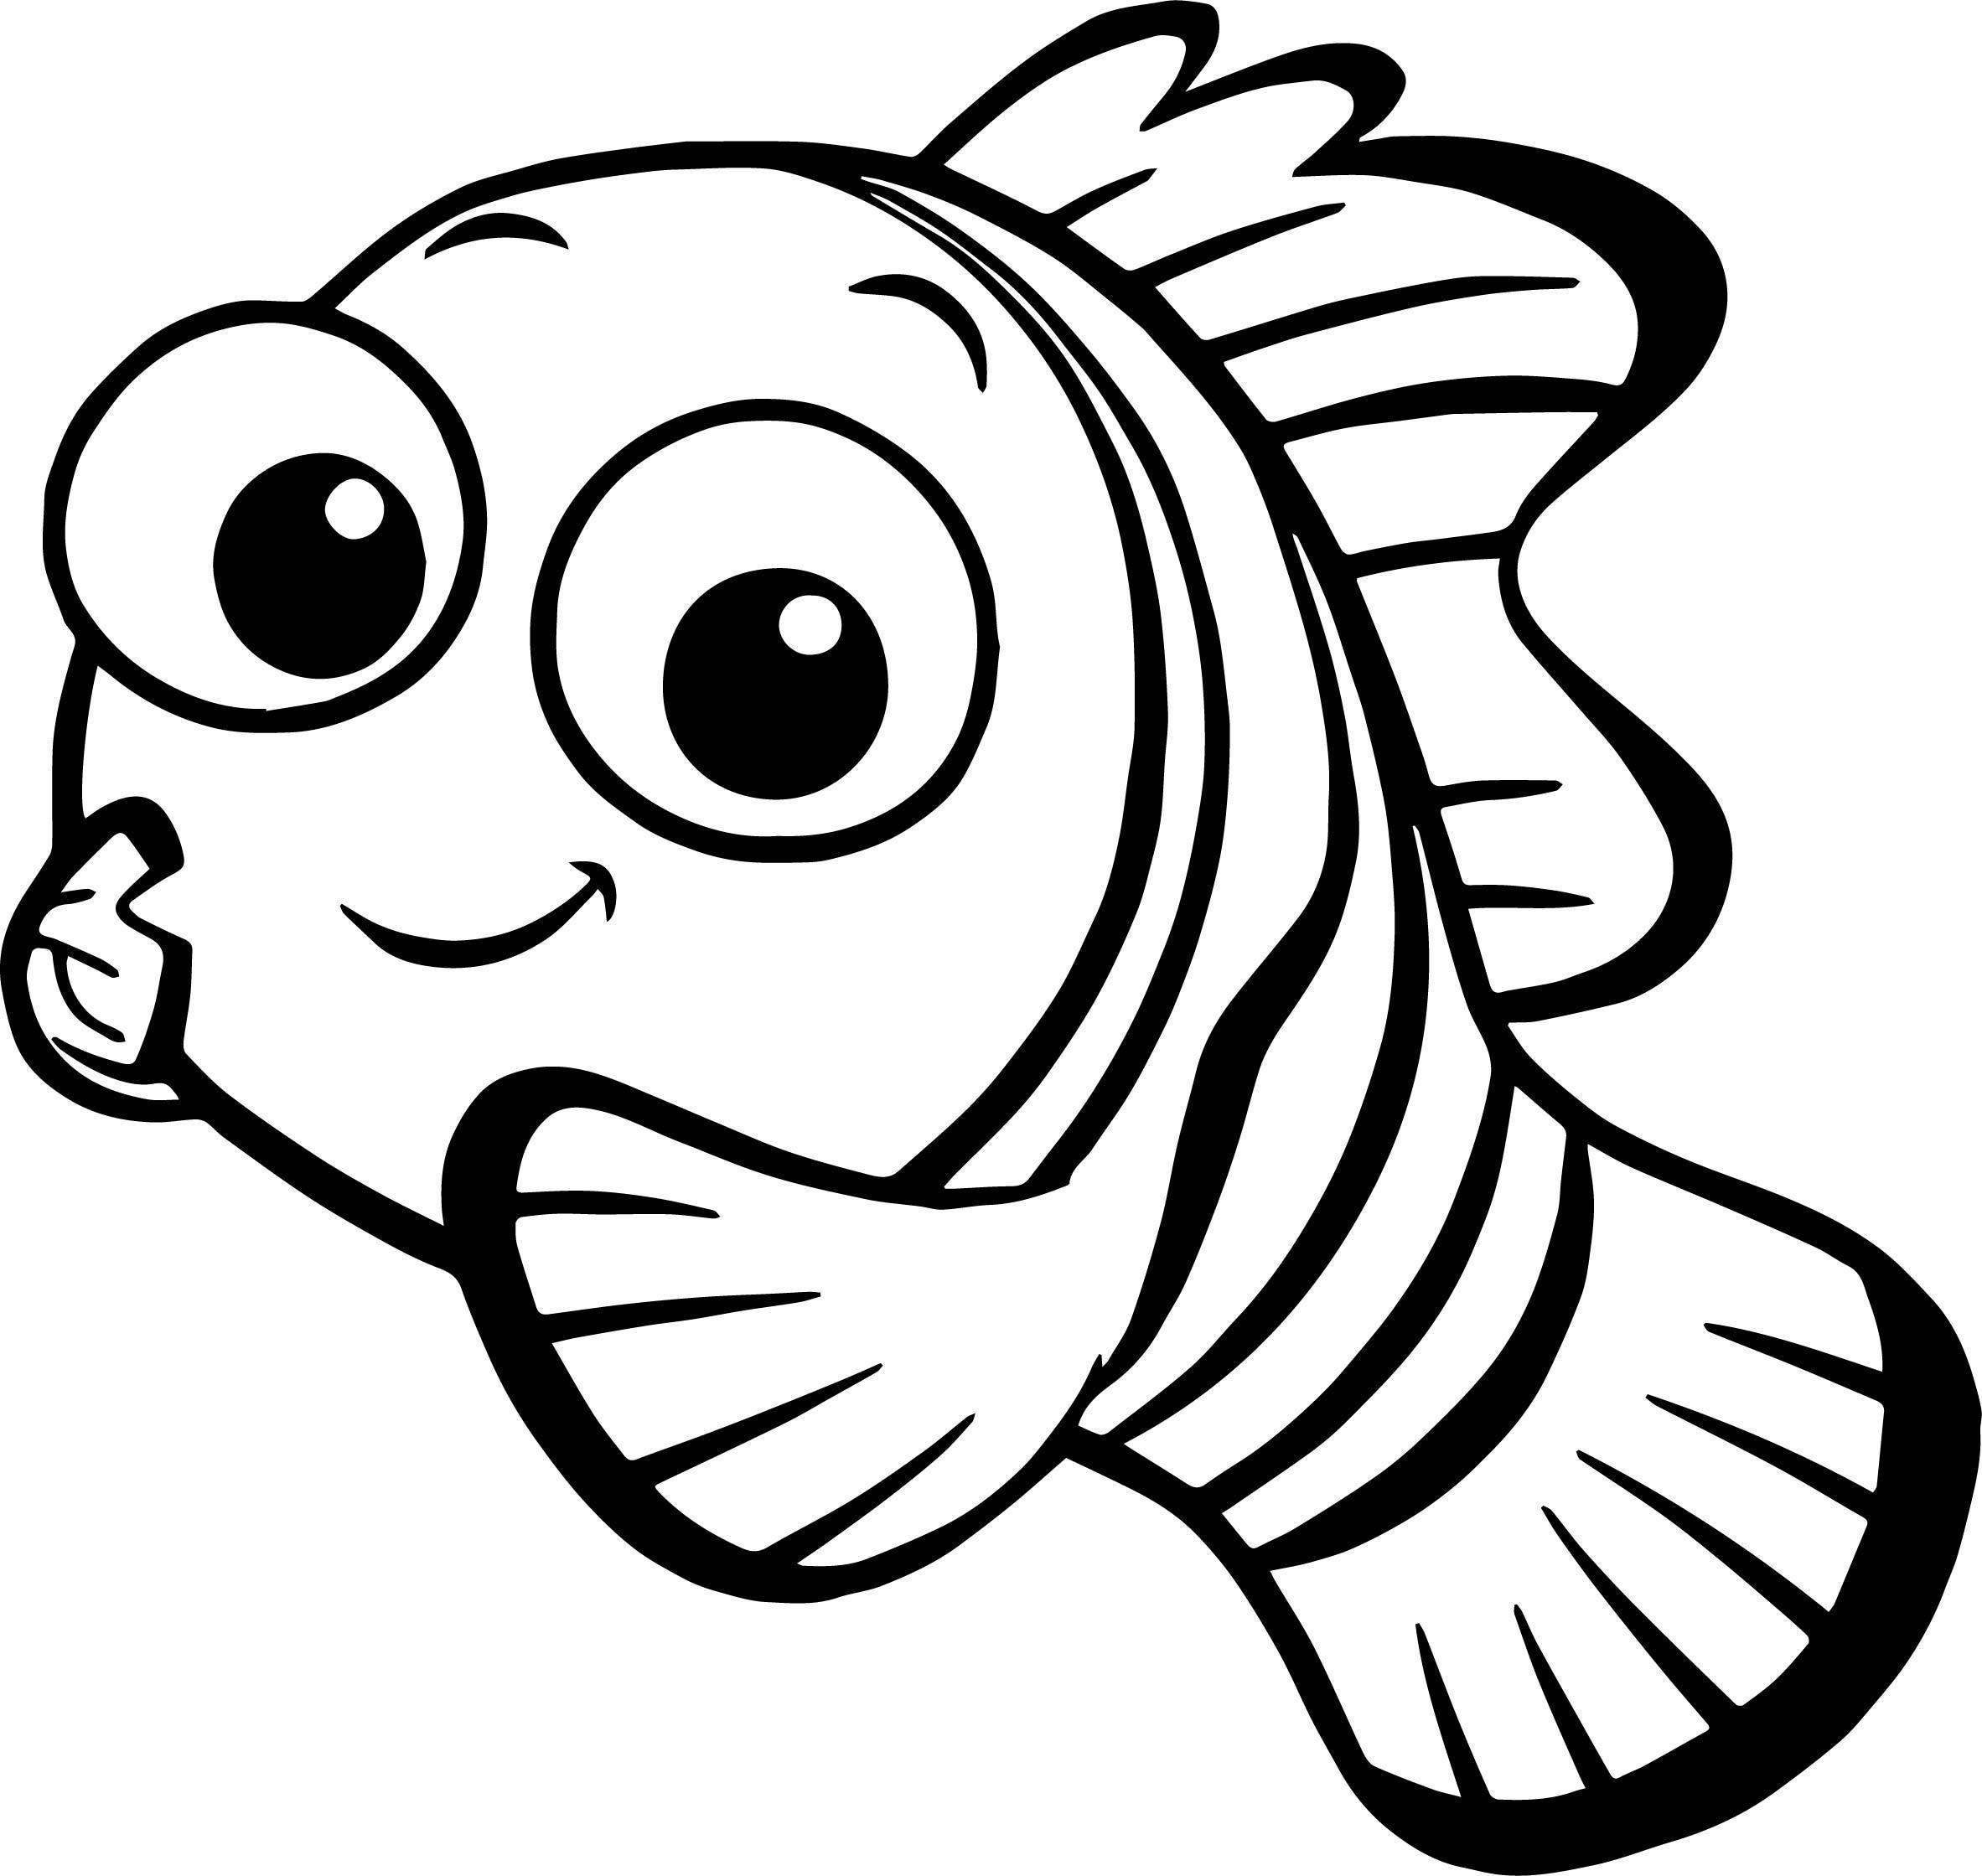 Finding Nemo Black and White Logo.